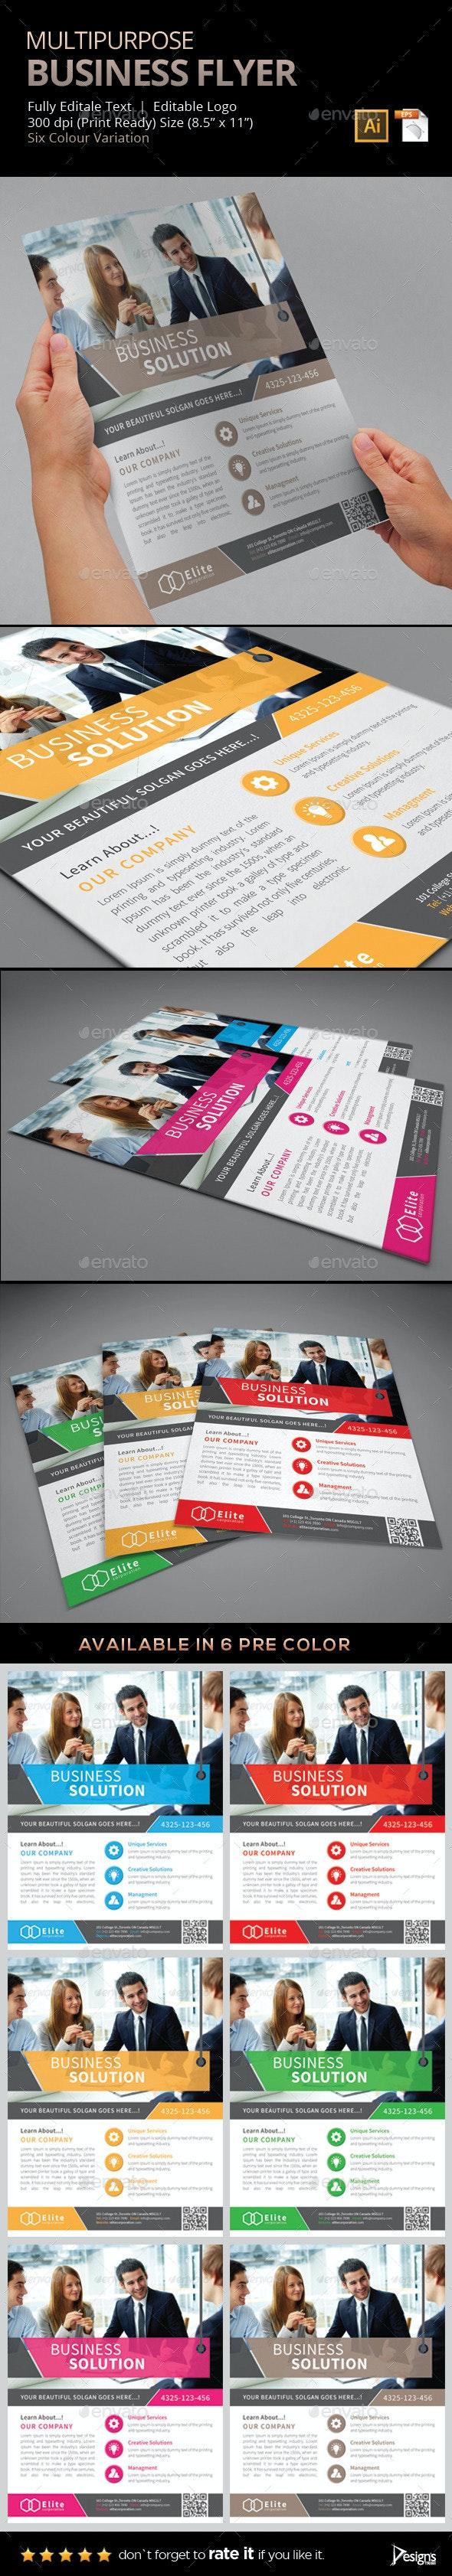 Flyer - Multipurpose Business Flyer 7 - Flyers Print Templates